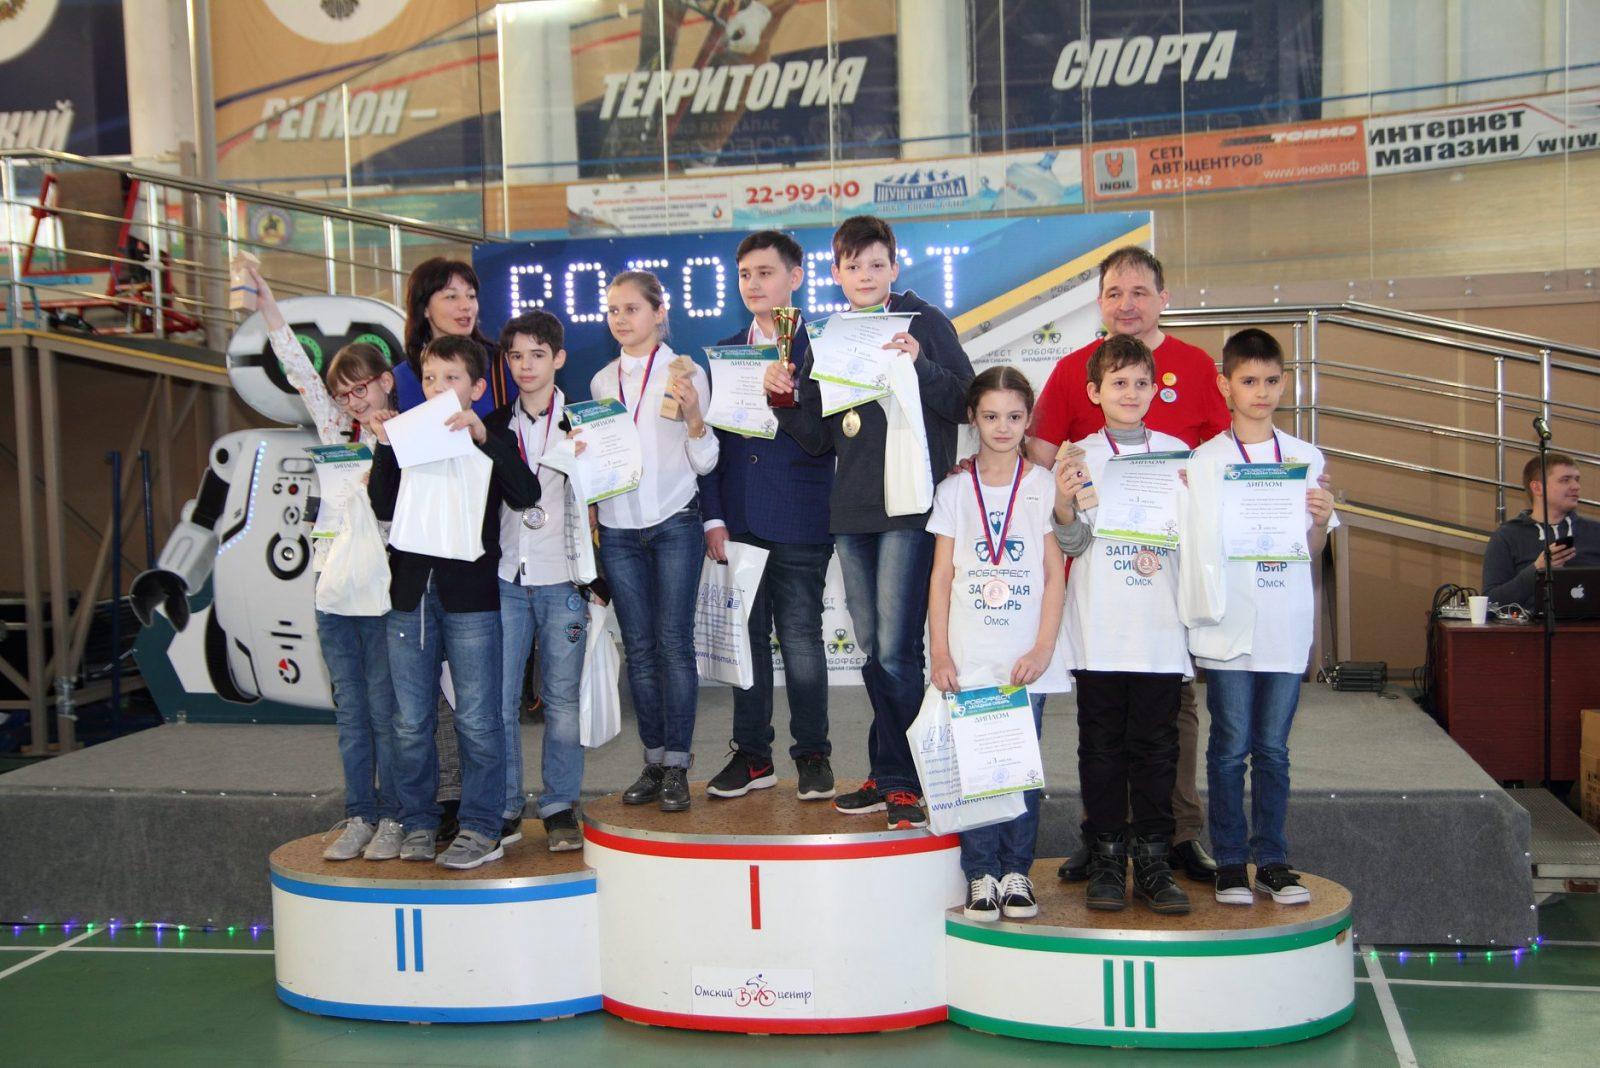 Итоги IV Международного IT-Форума в Омске